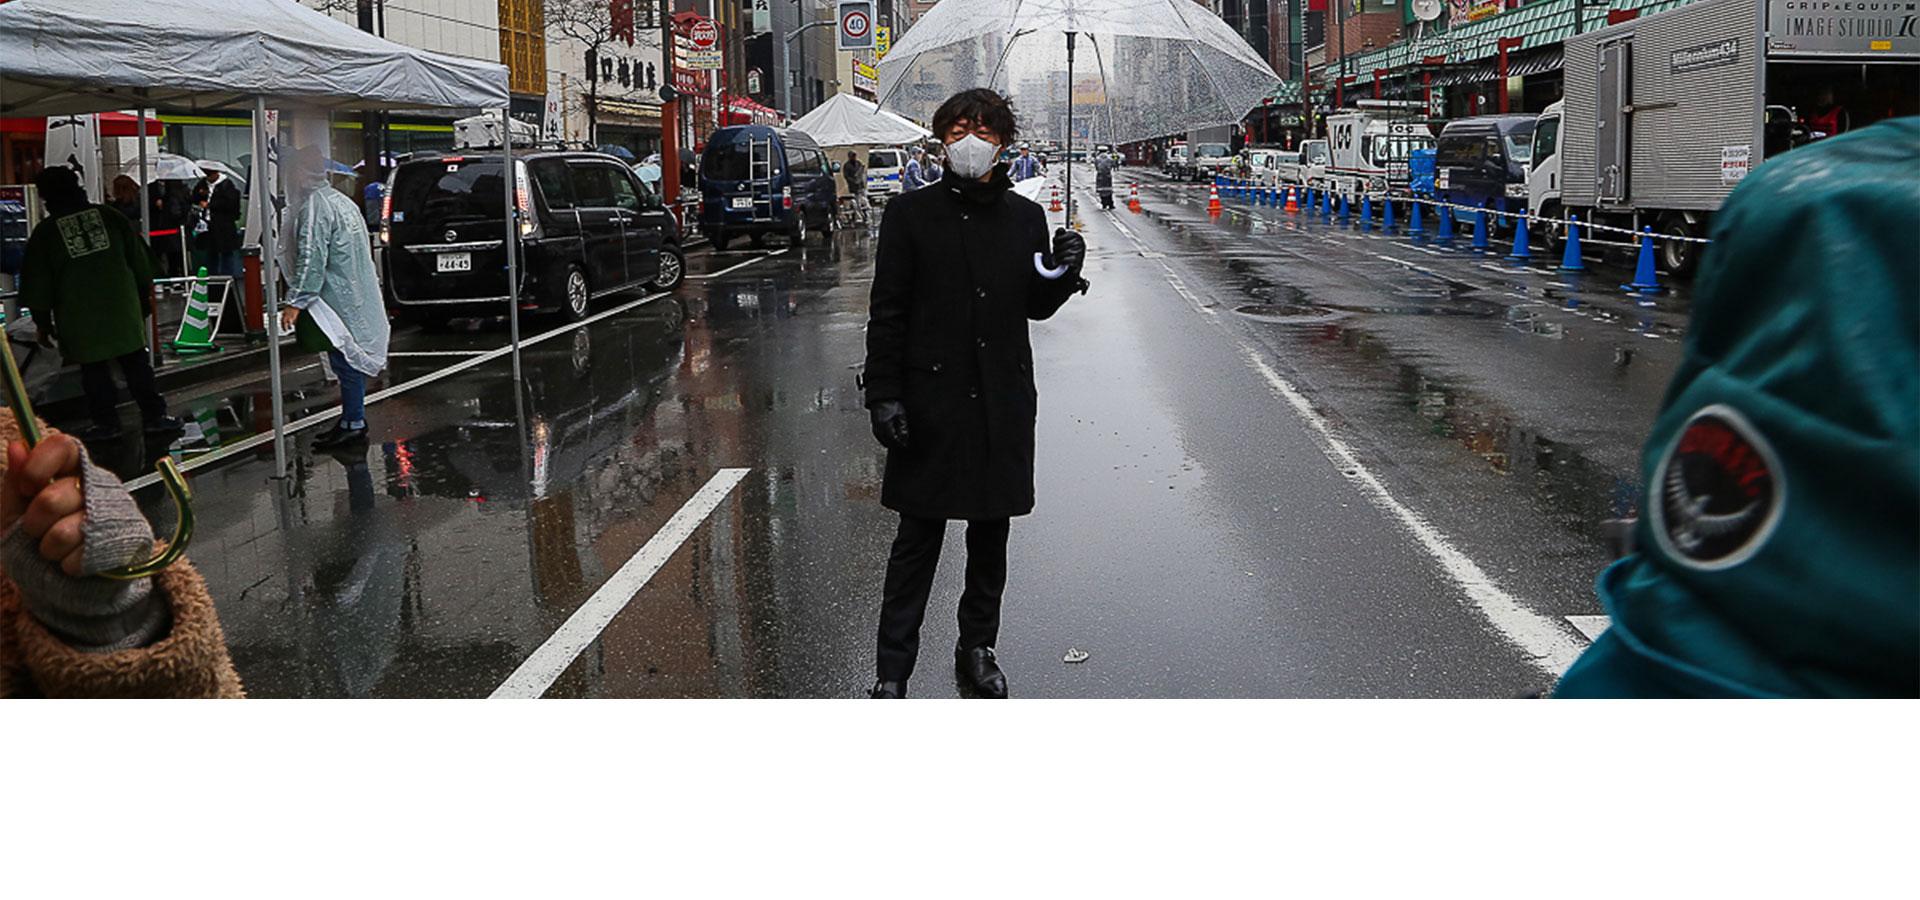 Lluvia en Tokio